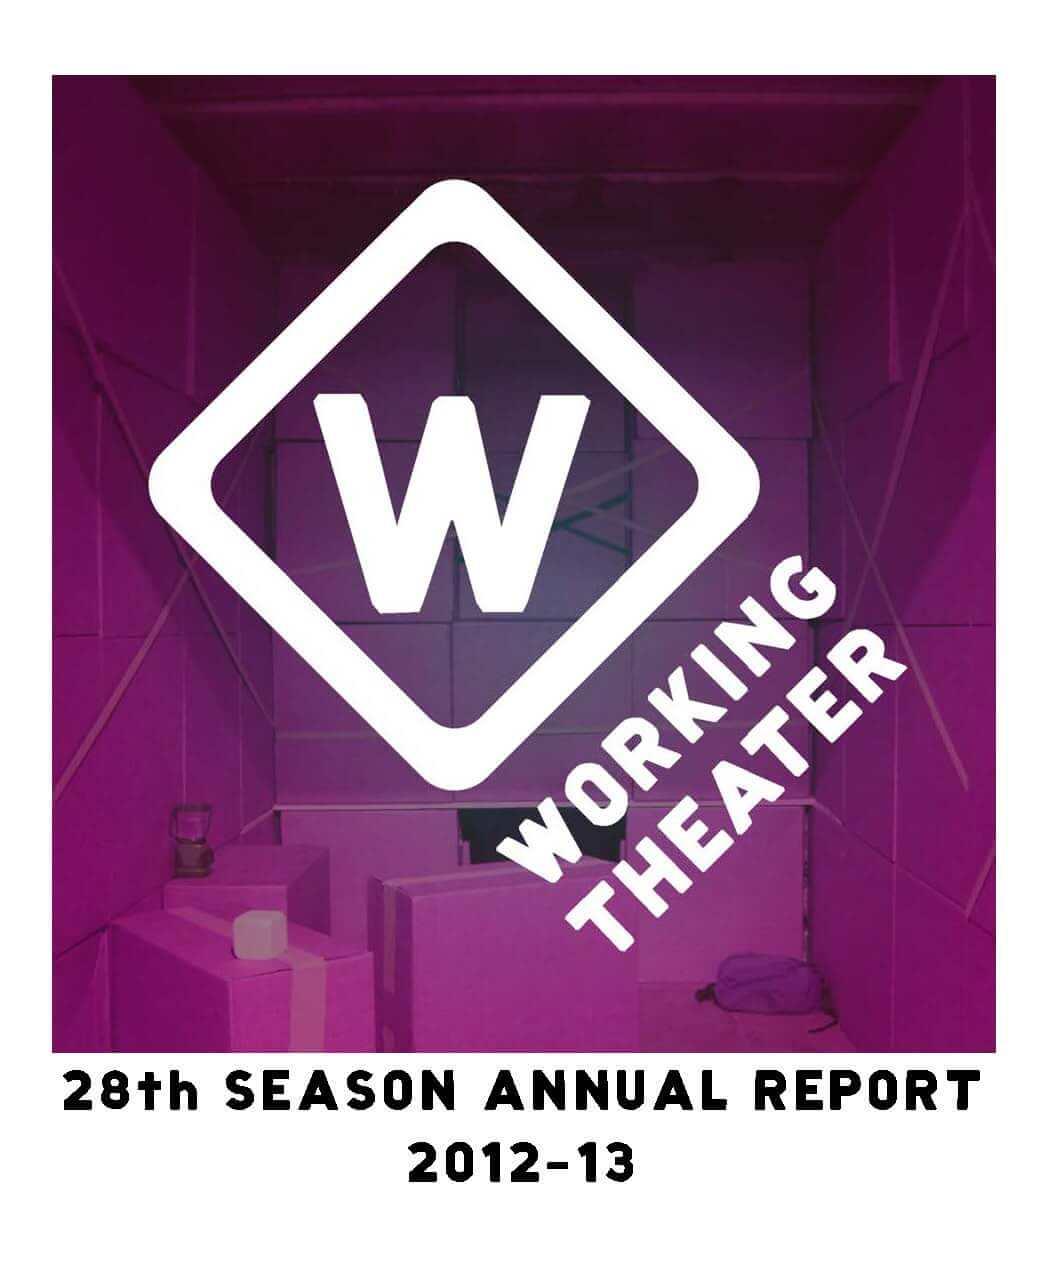 28th season report